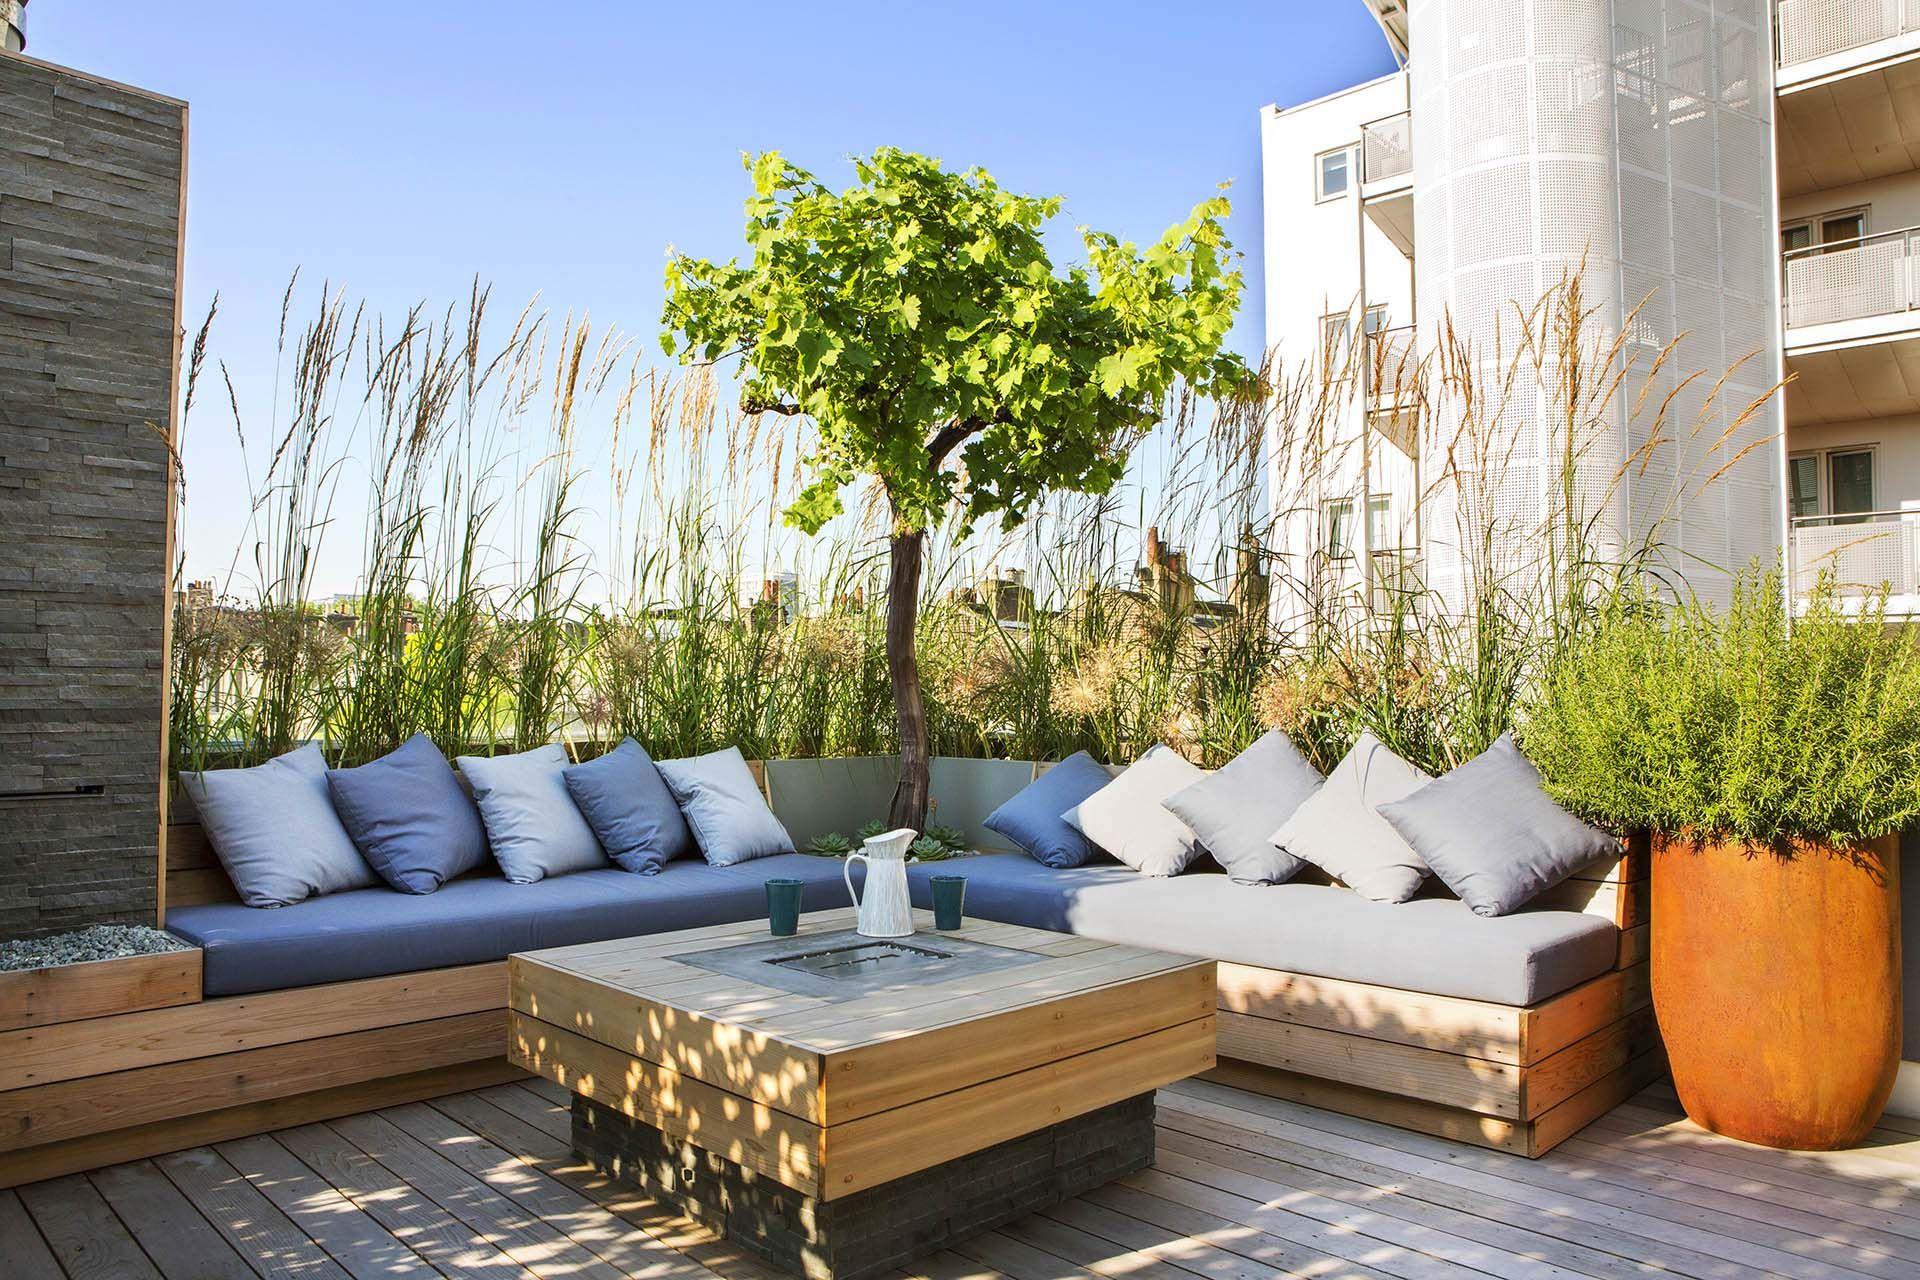 adolfo harrison rooftop residential garden notting hill